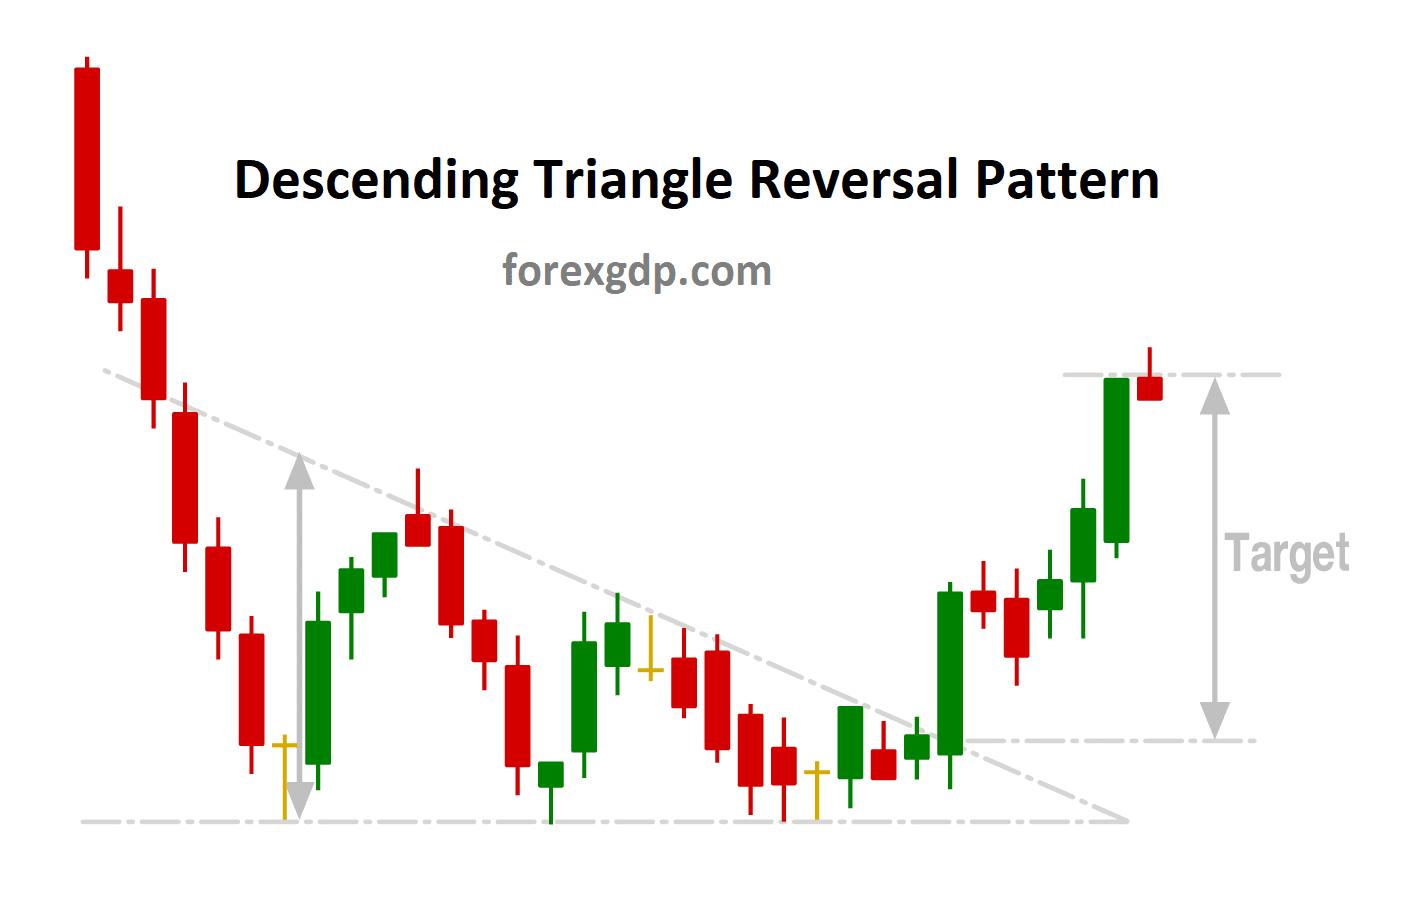 Descending Triangle Reversal take profit target